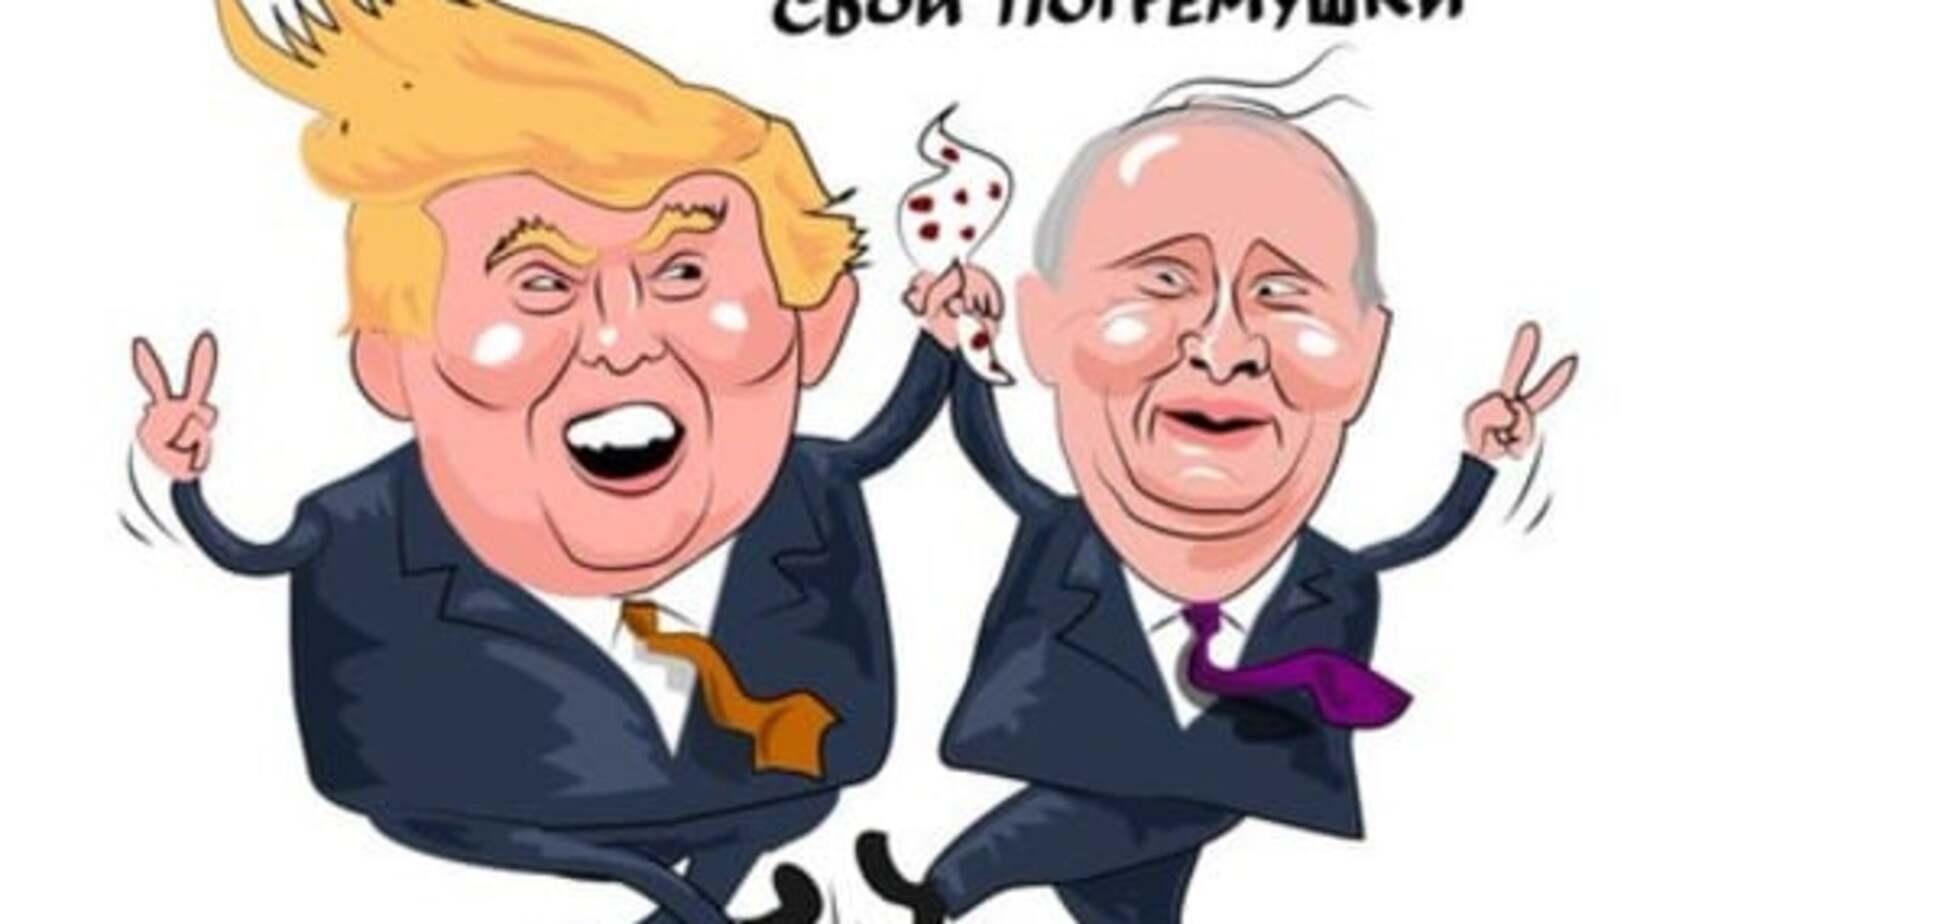 #Трампнаш: у мережі з'явилася смішна карикатура на Путіна і Трампа